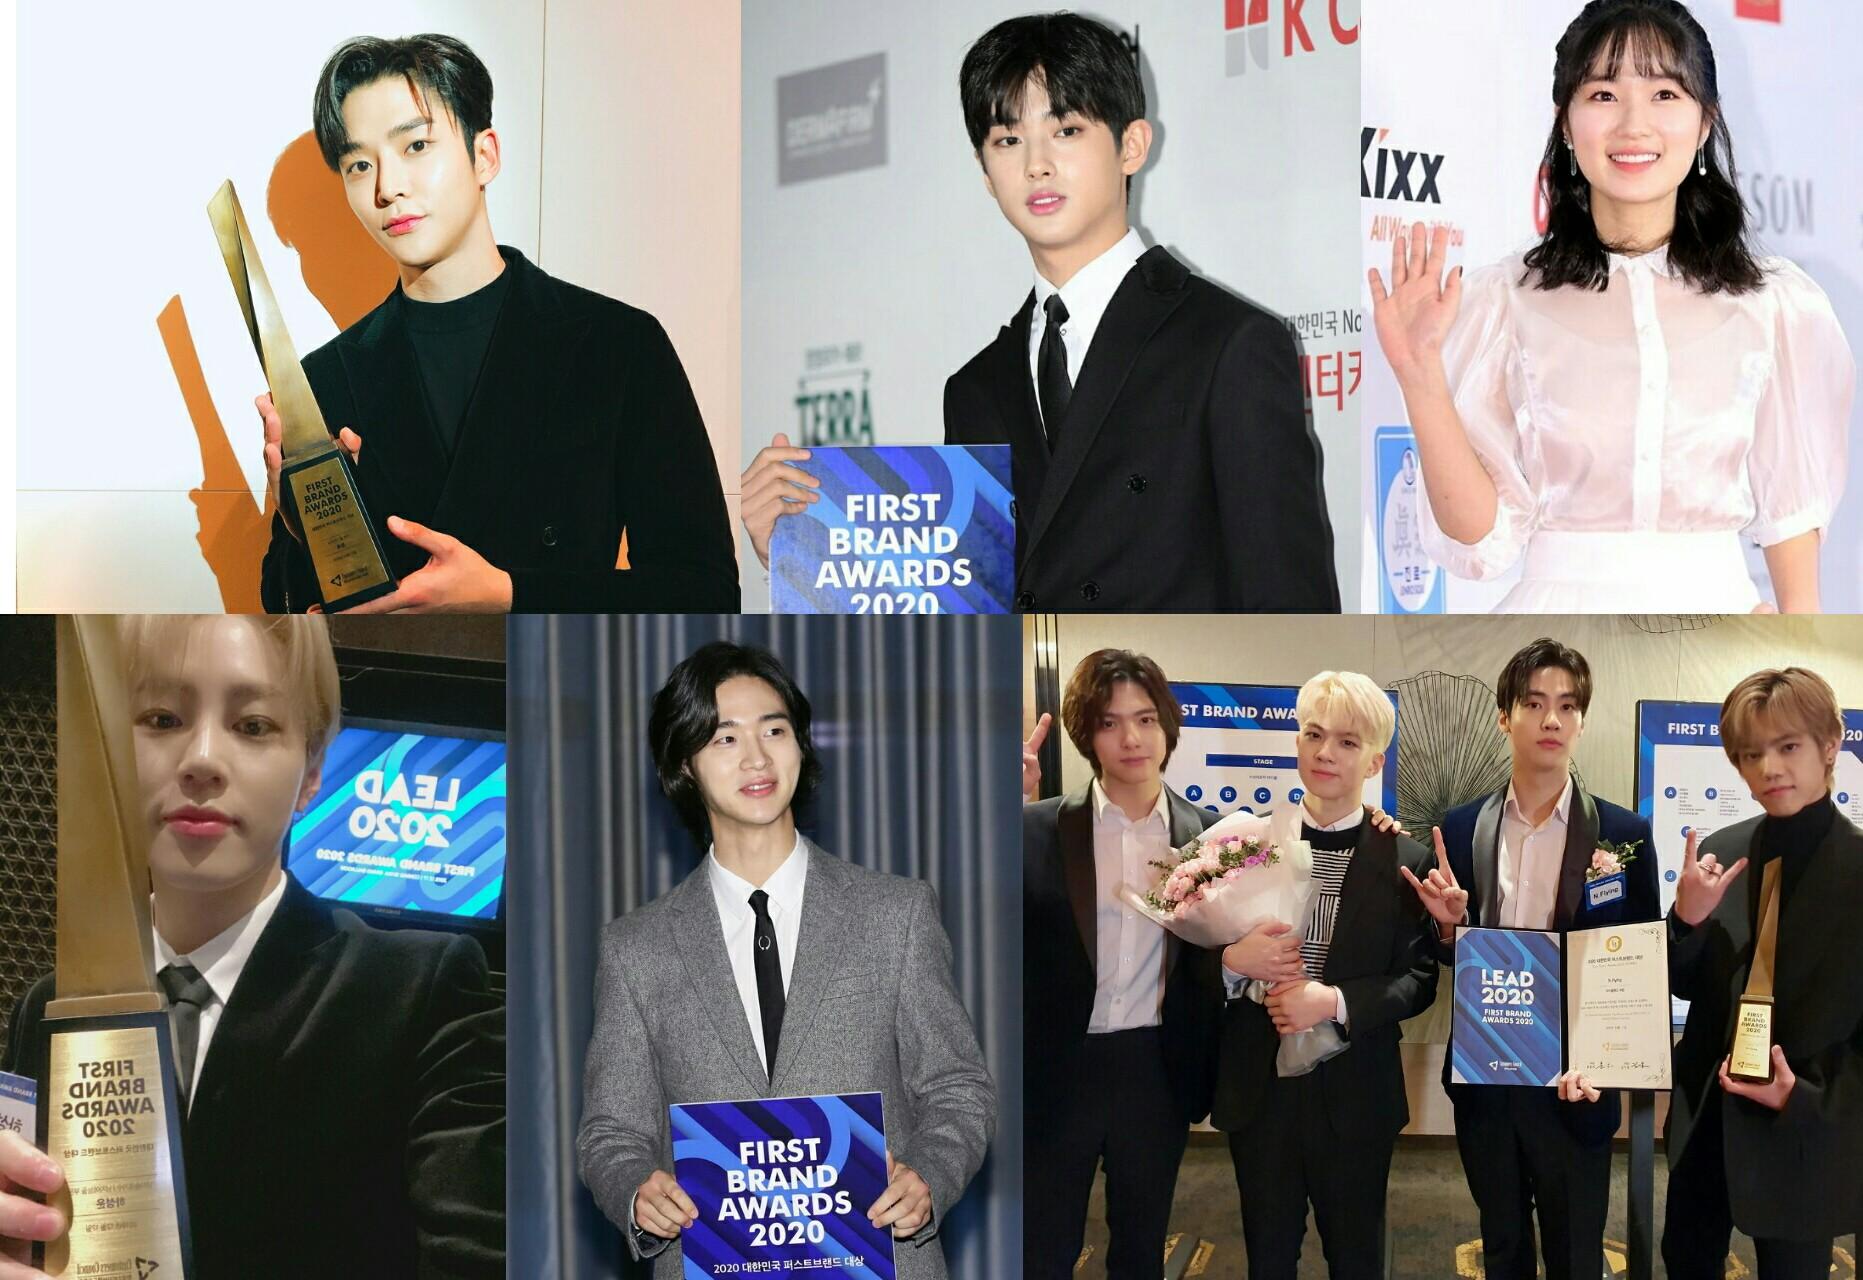 2020 korea first brand awards